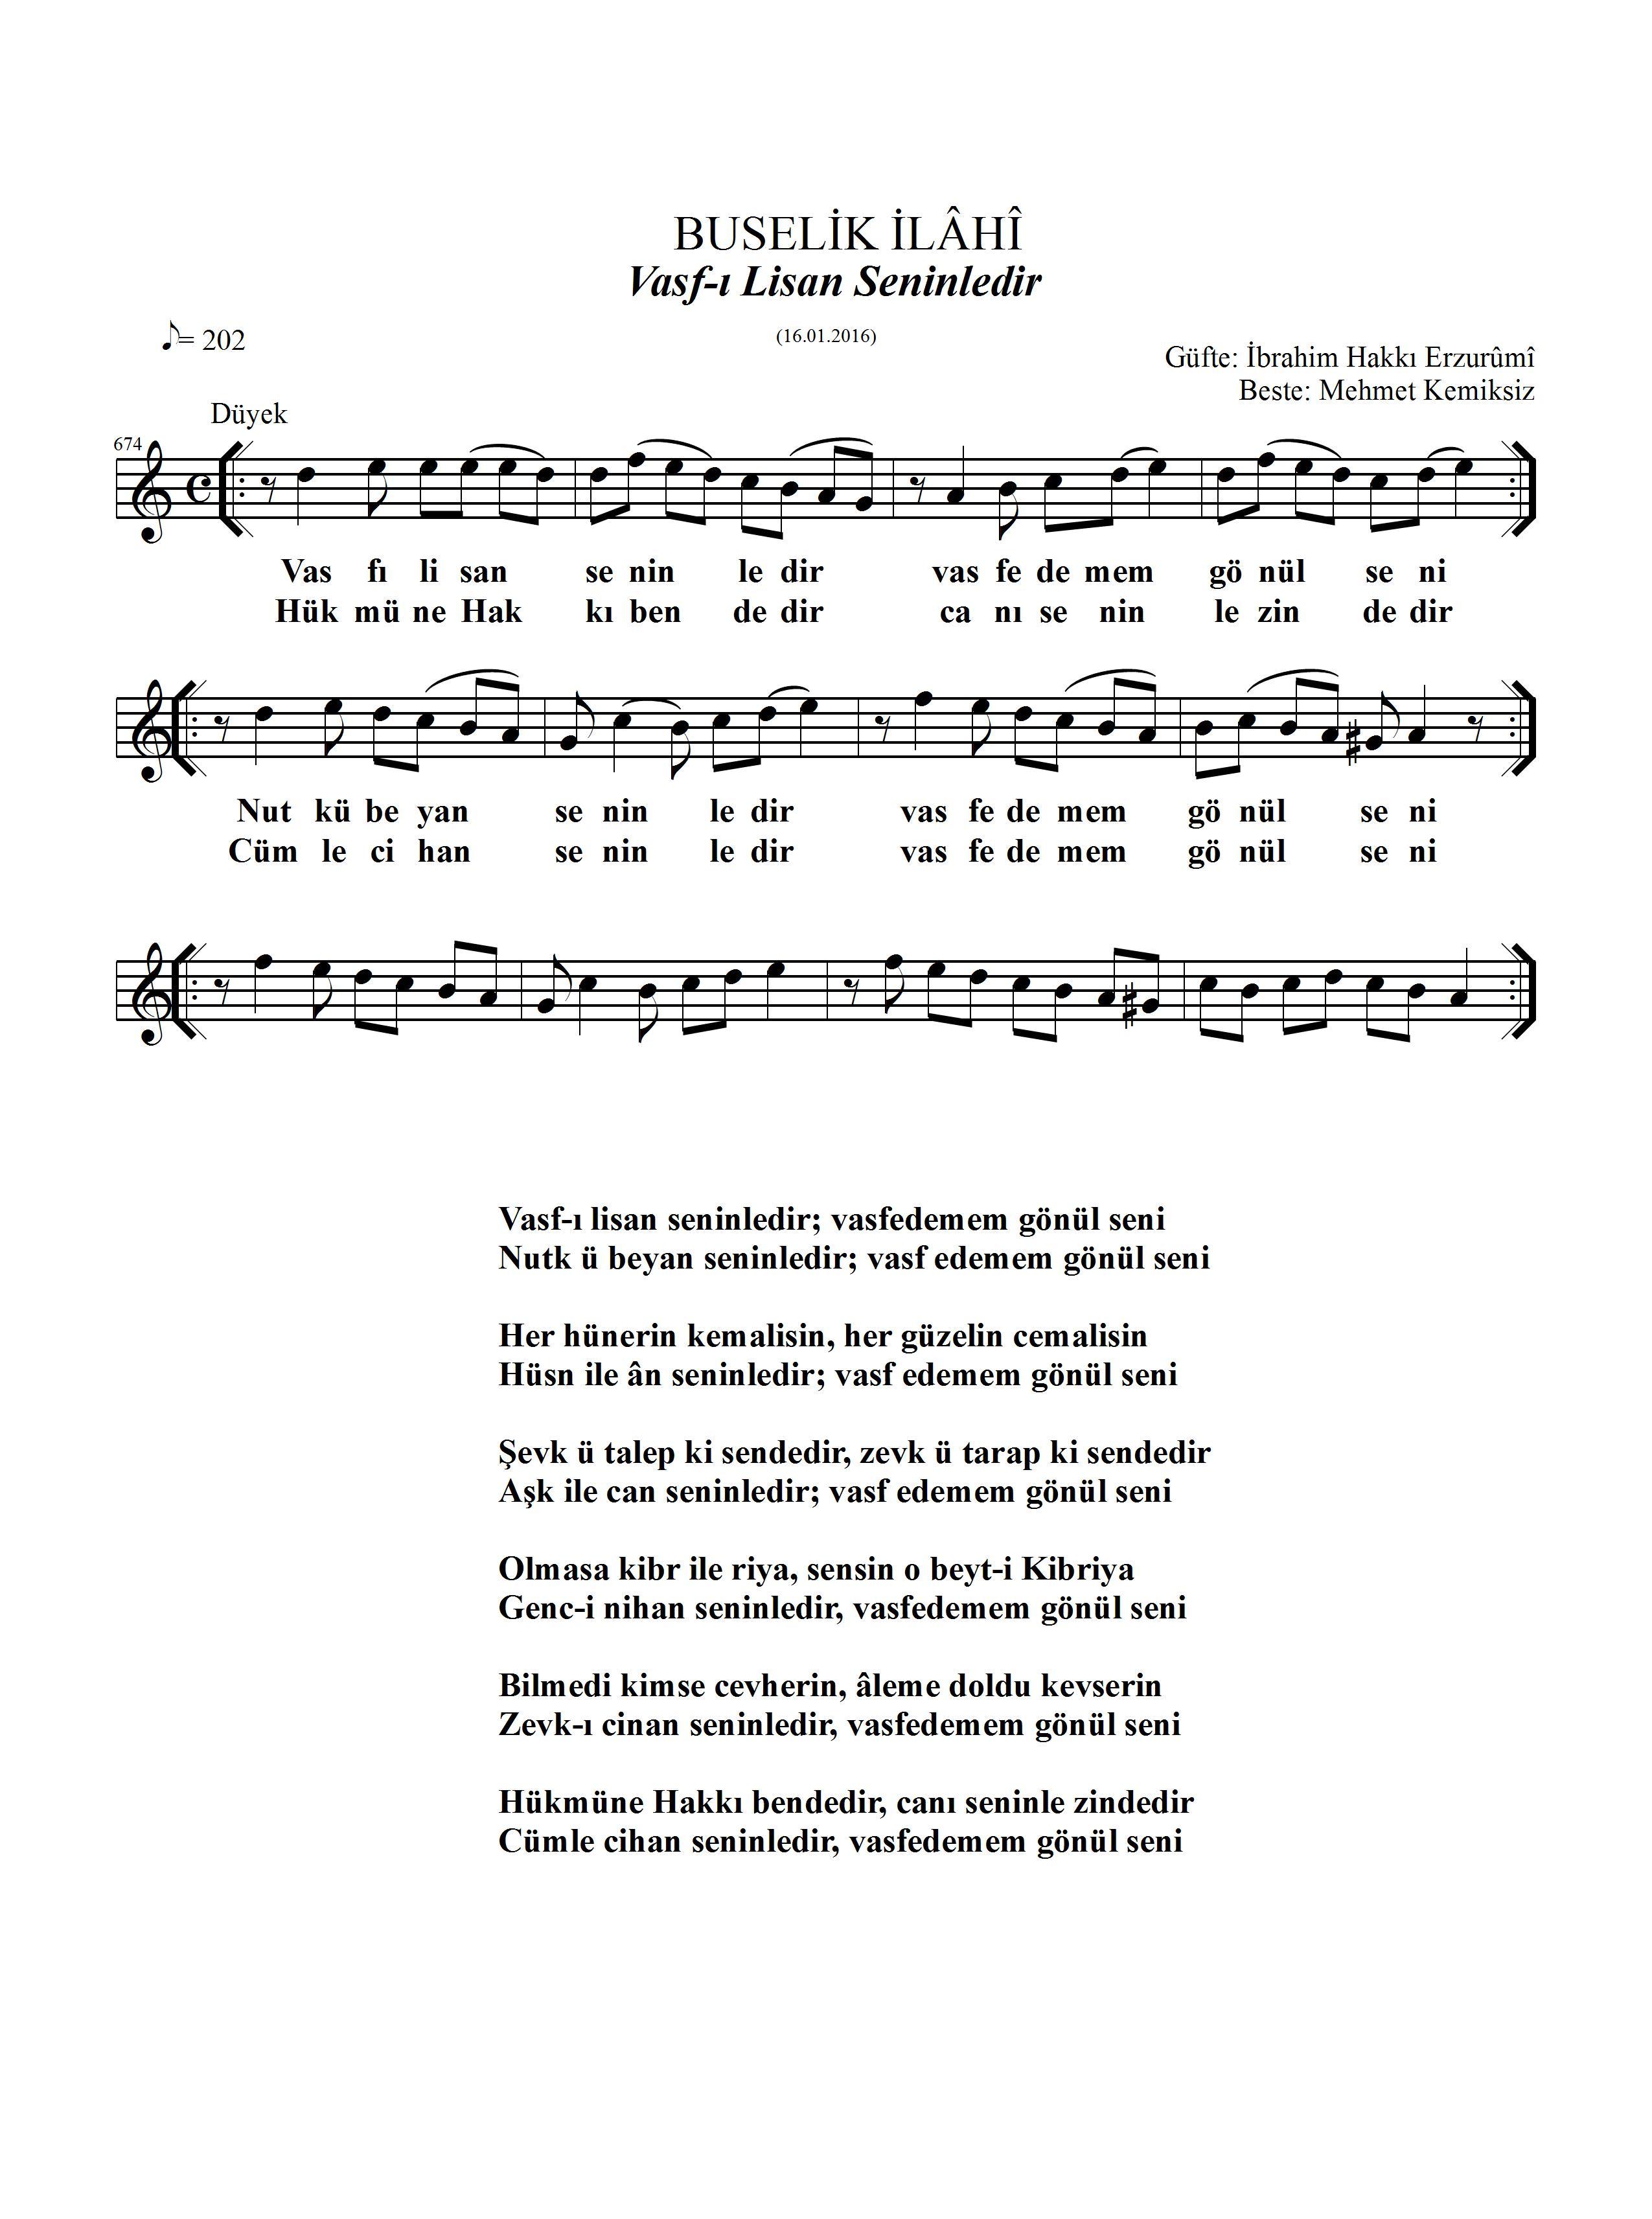 674-Buselik-VasfiLisan